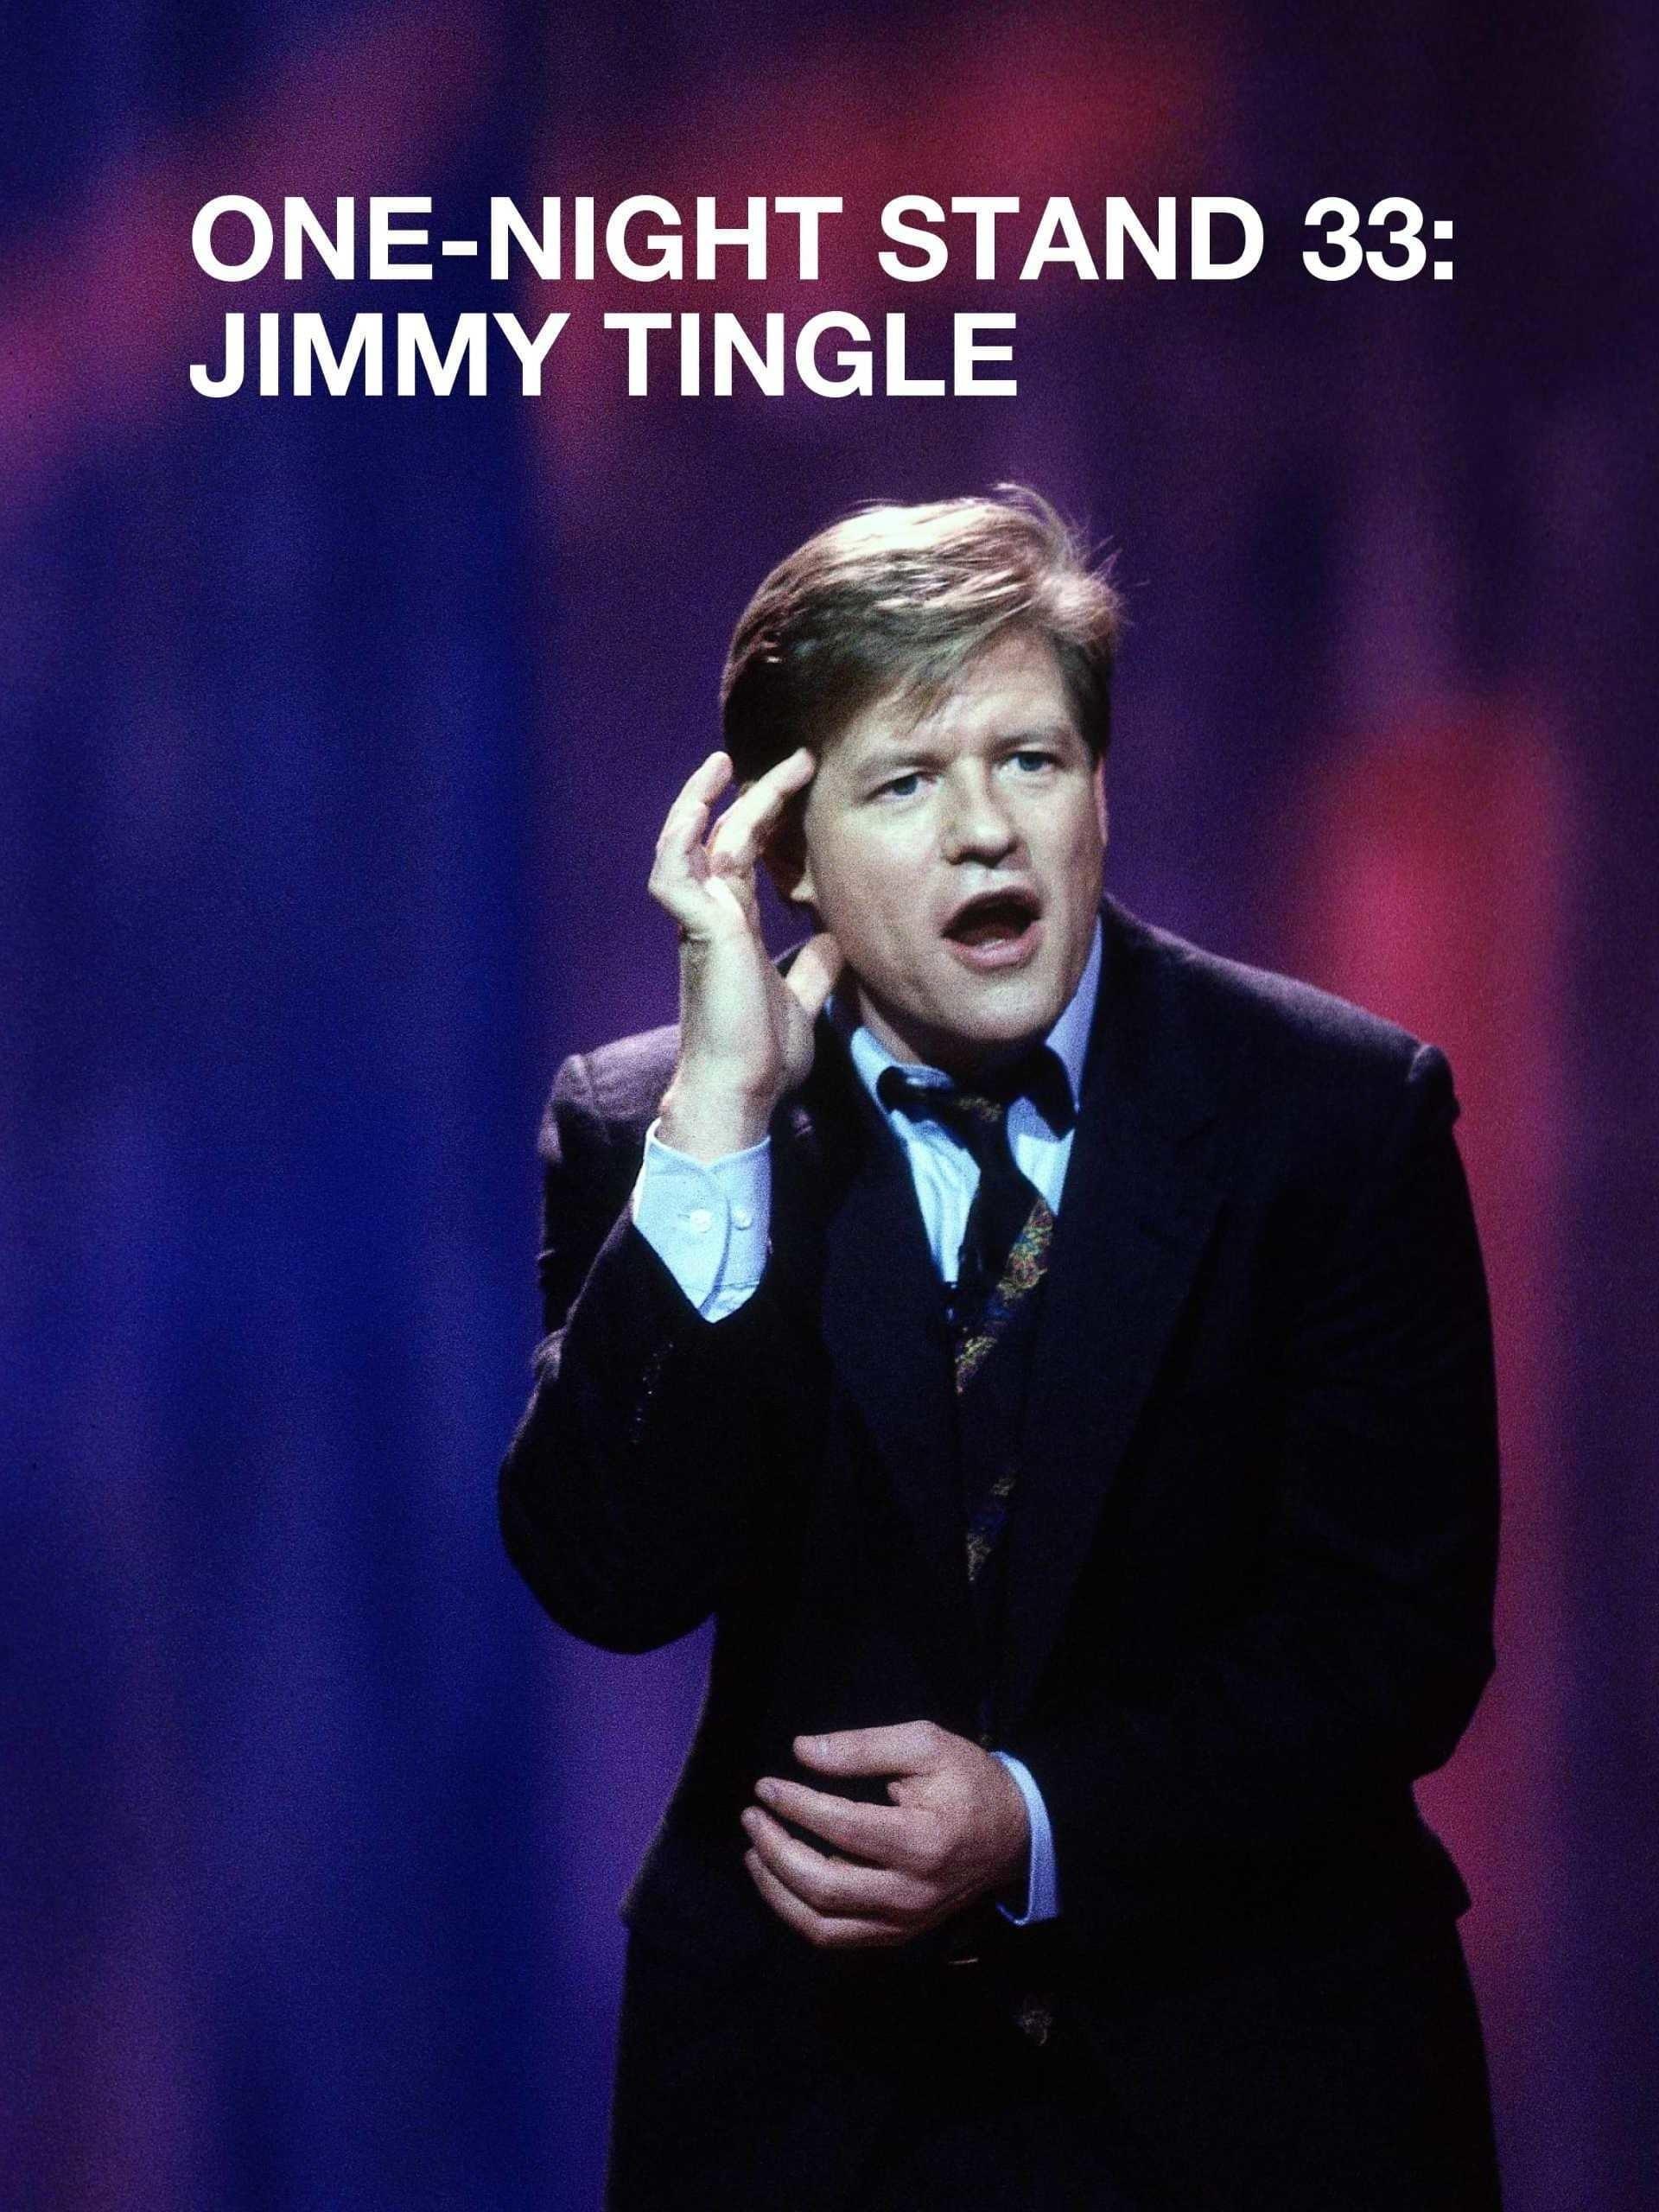 Jimmy Tingle: One Night Stand